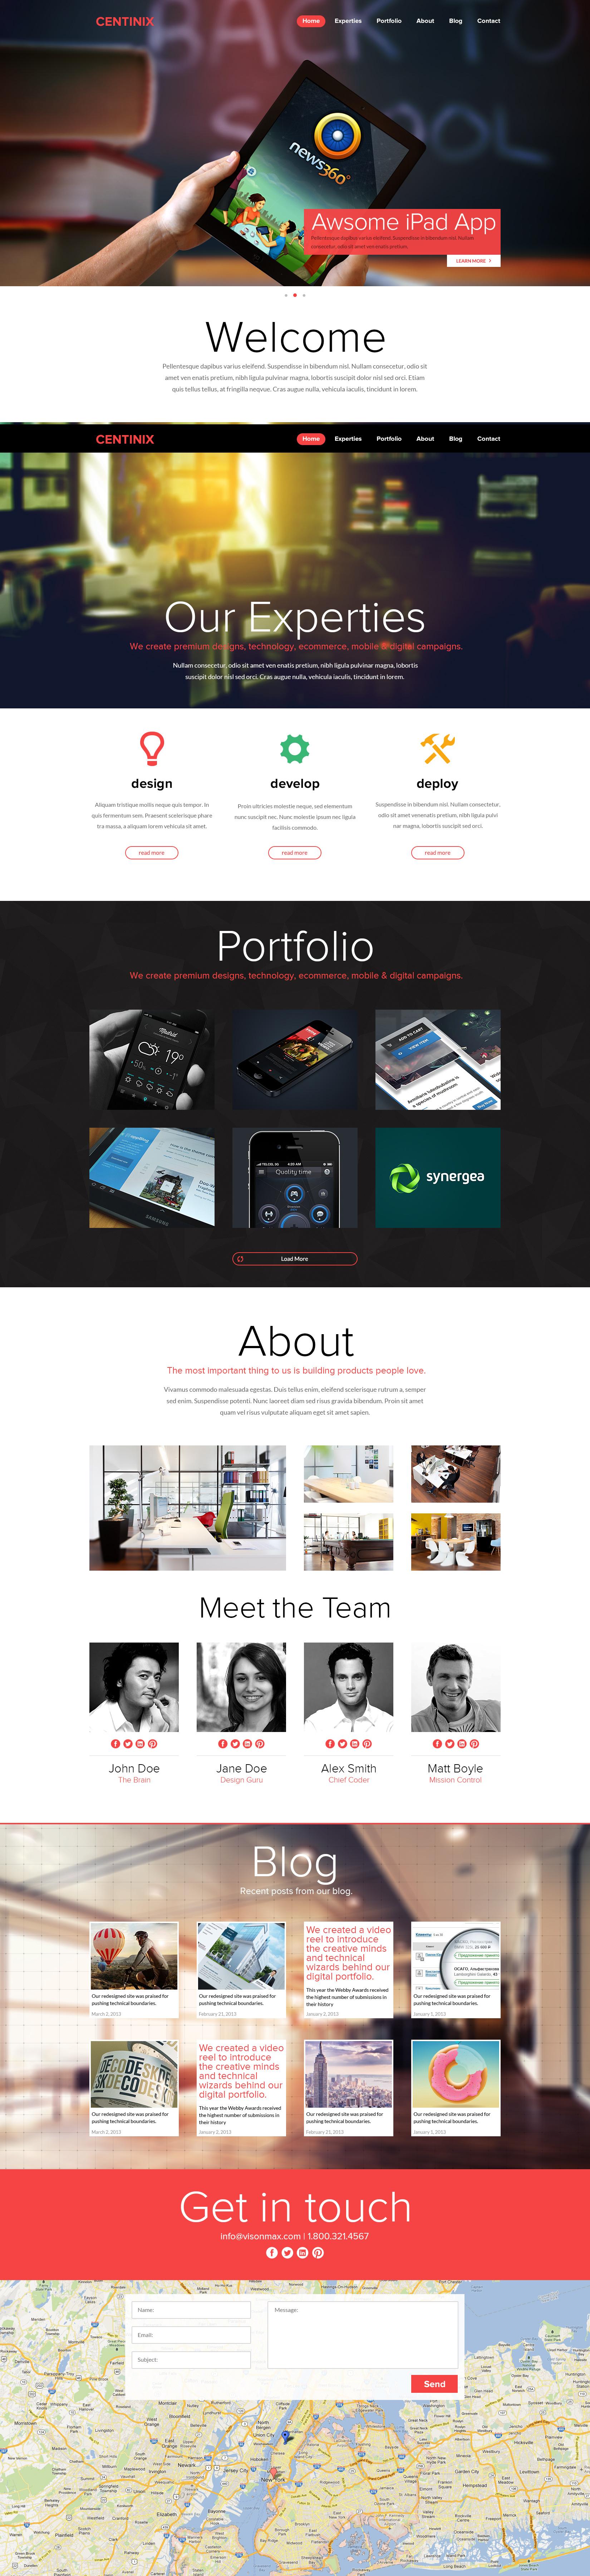 One Page Portfolio Website For Sale By Nas Wd On Deviantart Webdesign News Web Design Web Design Amazing Website Designs